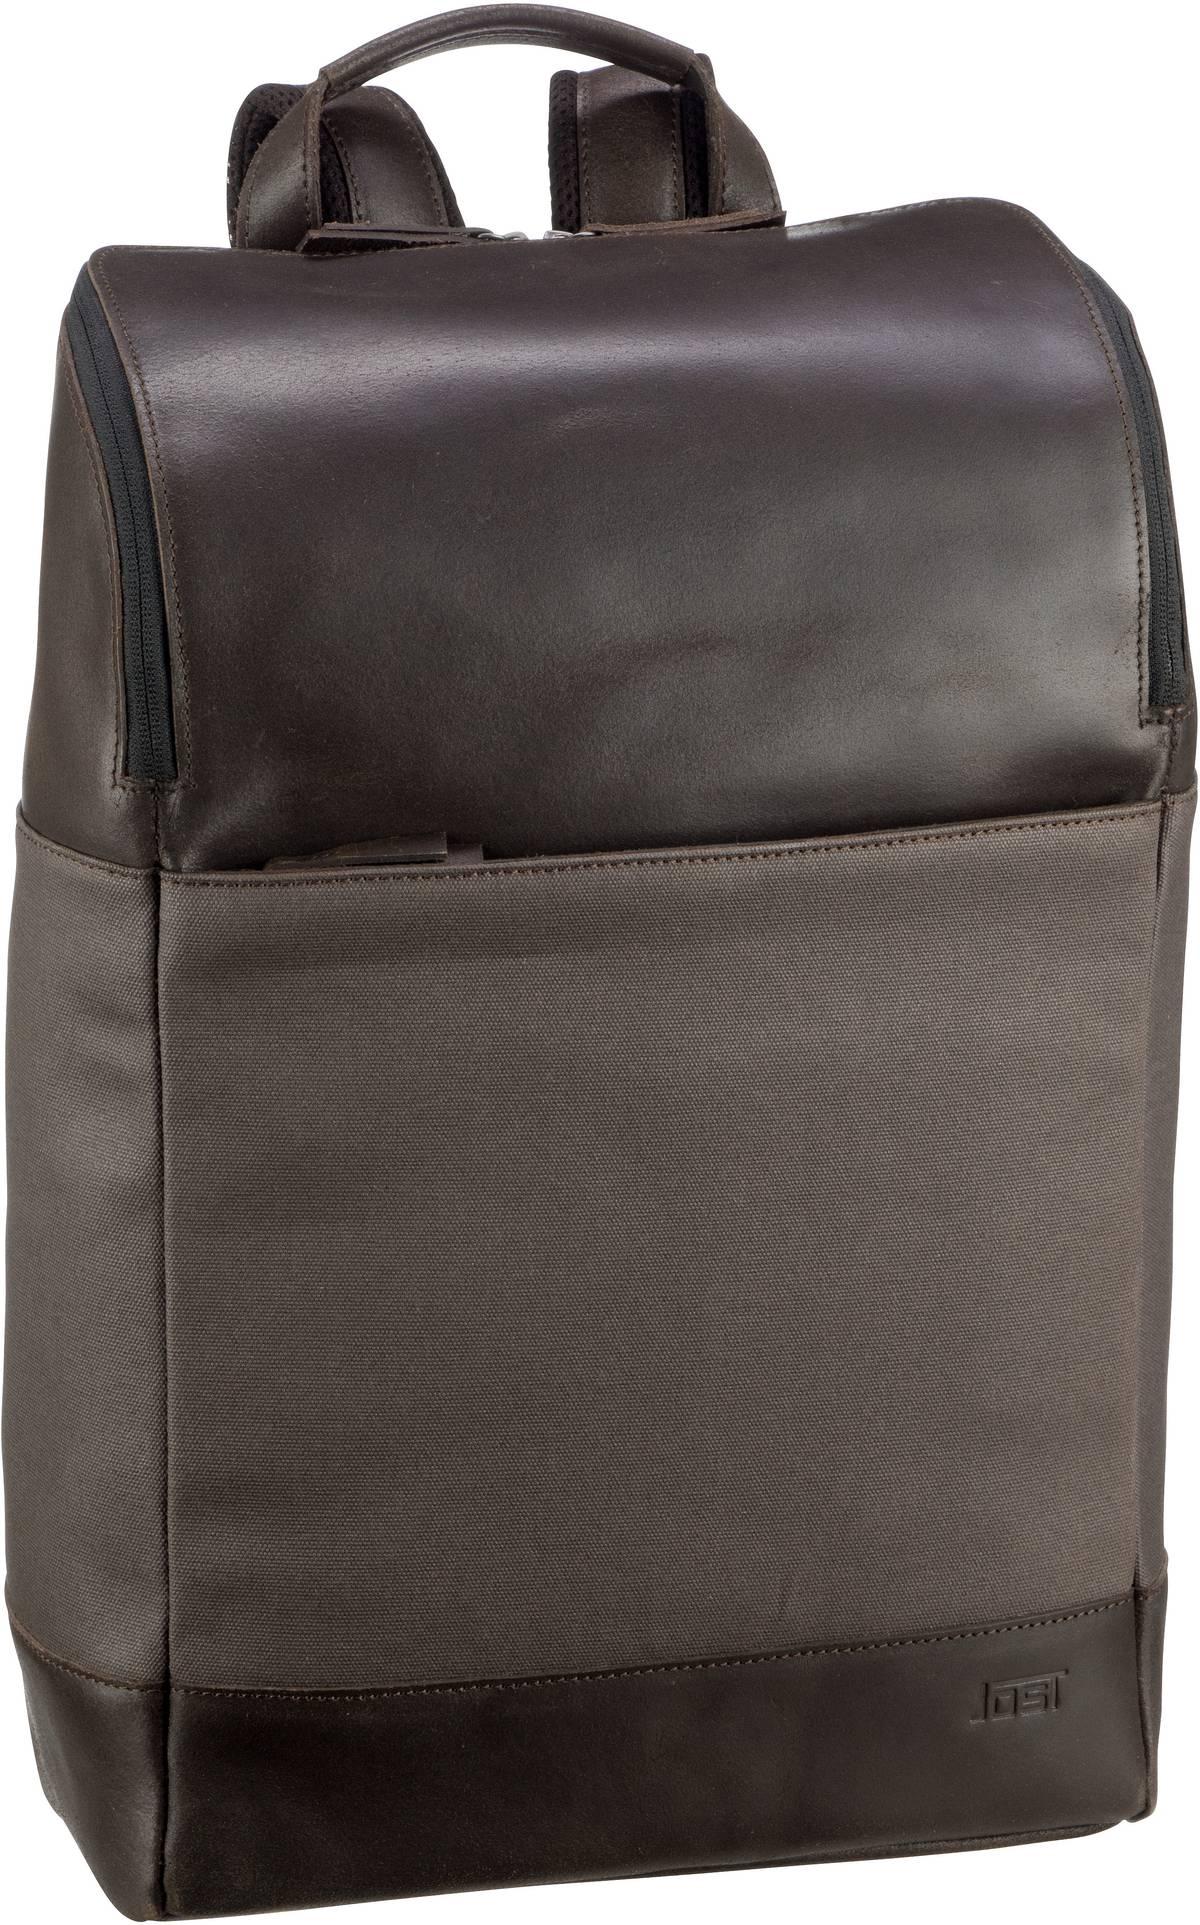 Rucksack / Daypack Varberg 7180 Daypack Braun